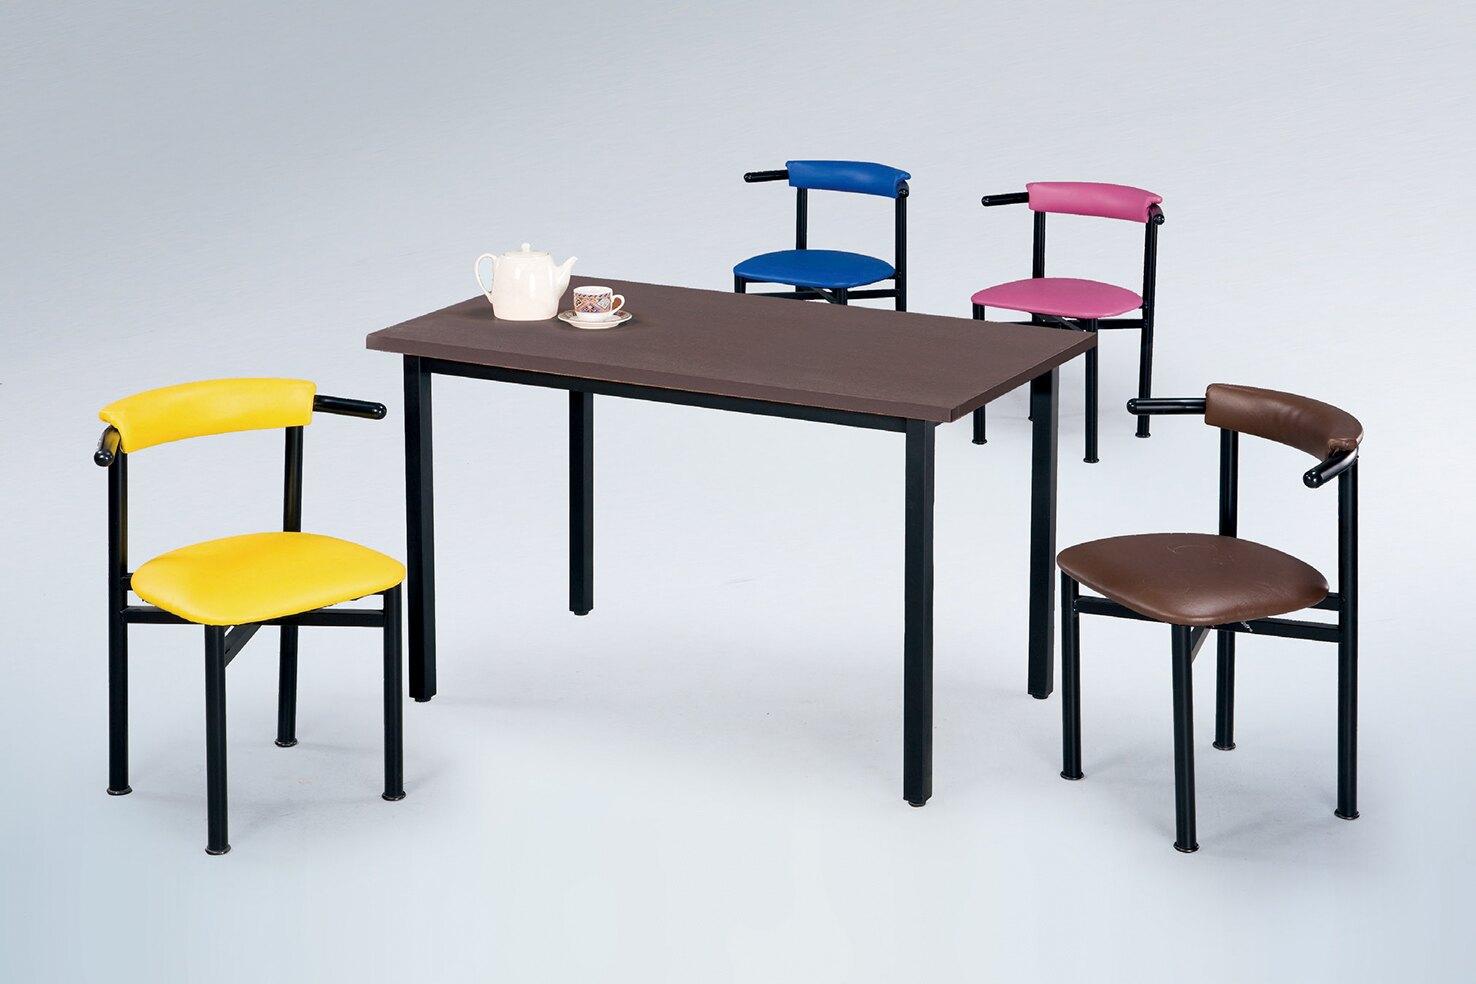 【 IS空間美學 】道奇4X2.5尺鐵刀木色餐桌+貝勒餐椅(1桌4椅)